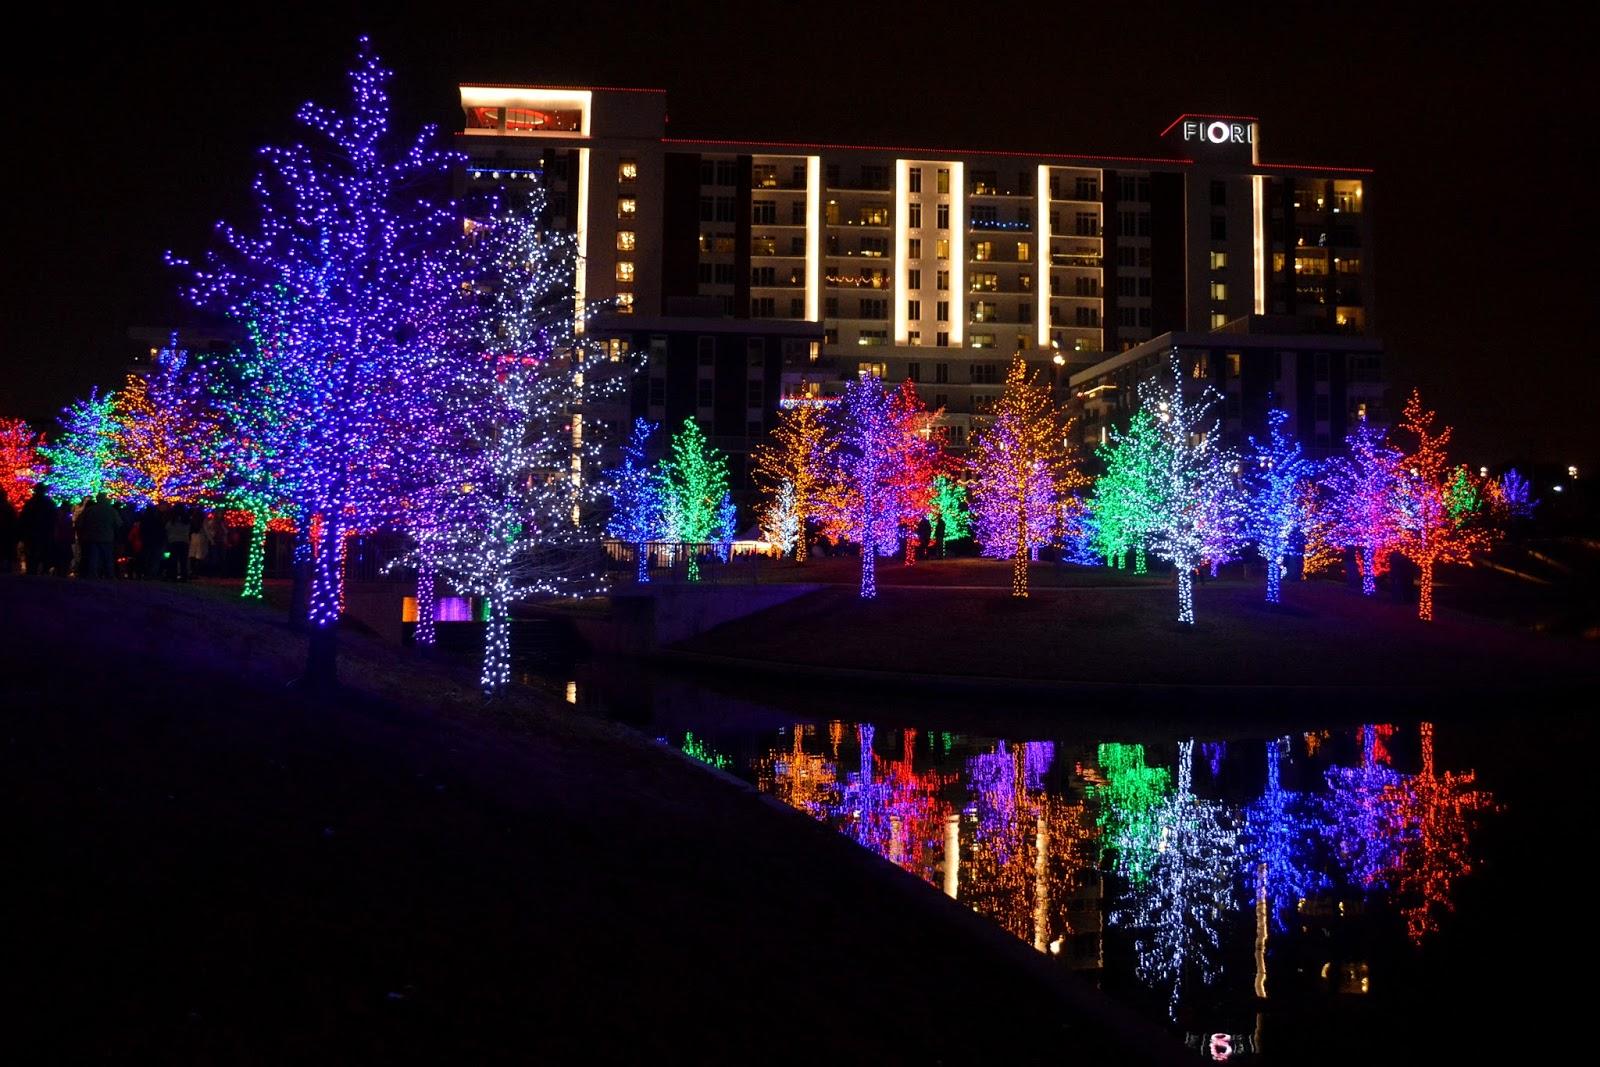 Terrell Daily Photo Vitruvian Park Addison Lights Fiori Texas Christmas